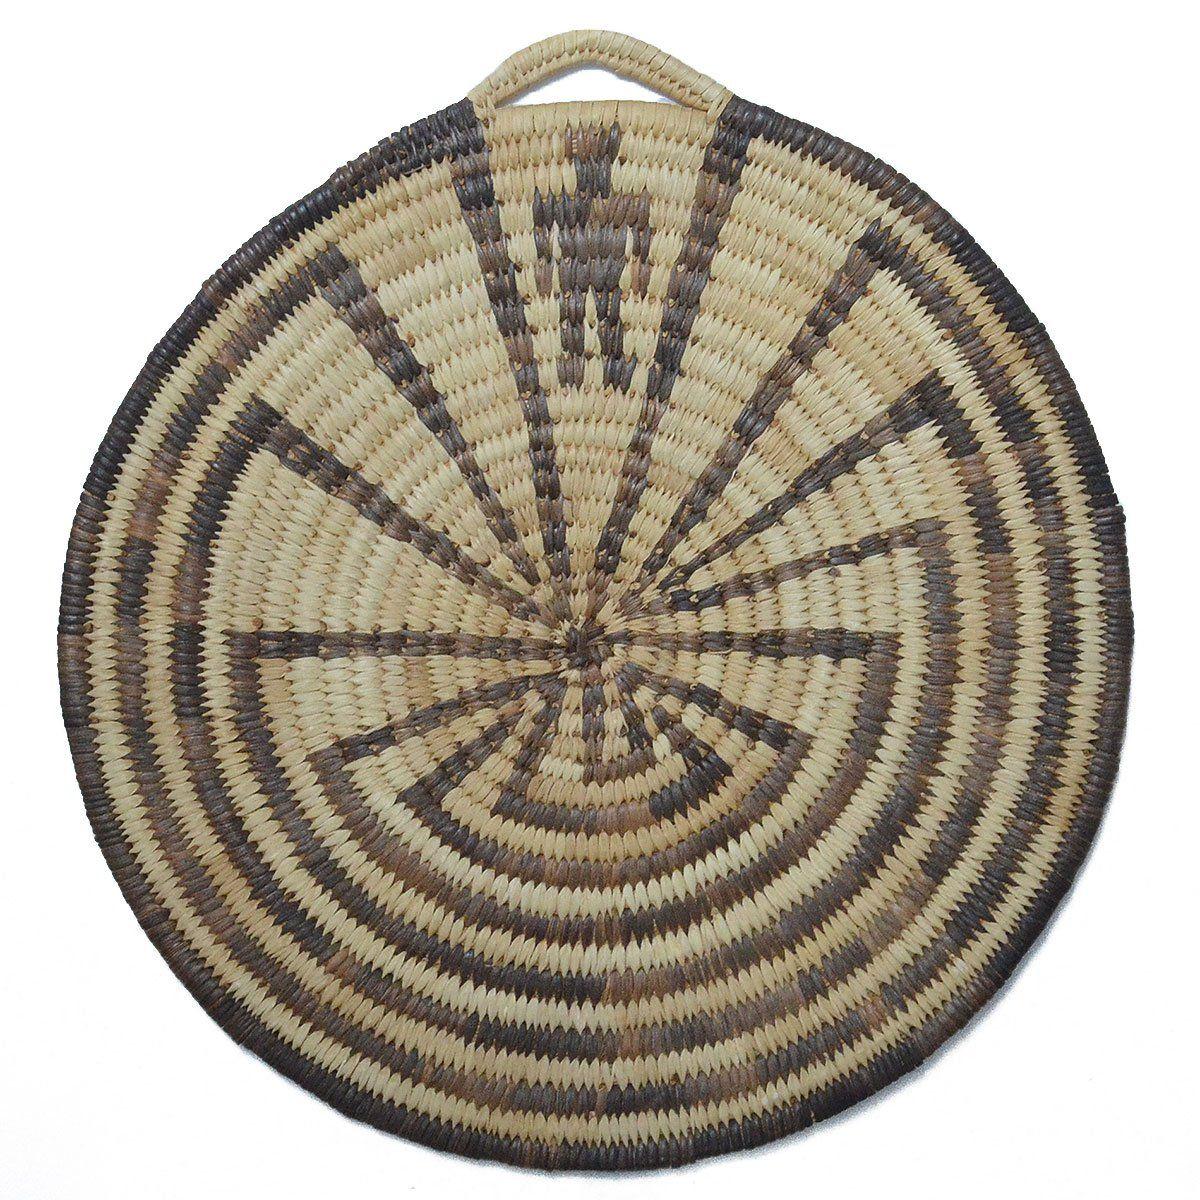 Santa Fe Show Basketry Vintage Tohono Oodham Man In Maze Ca 1940